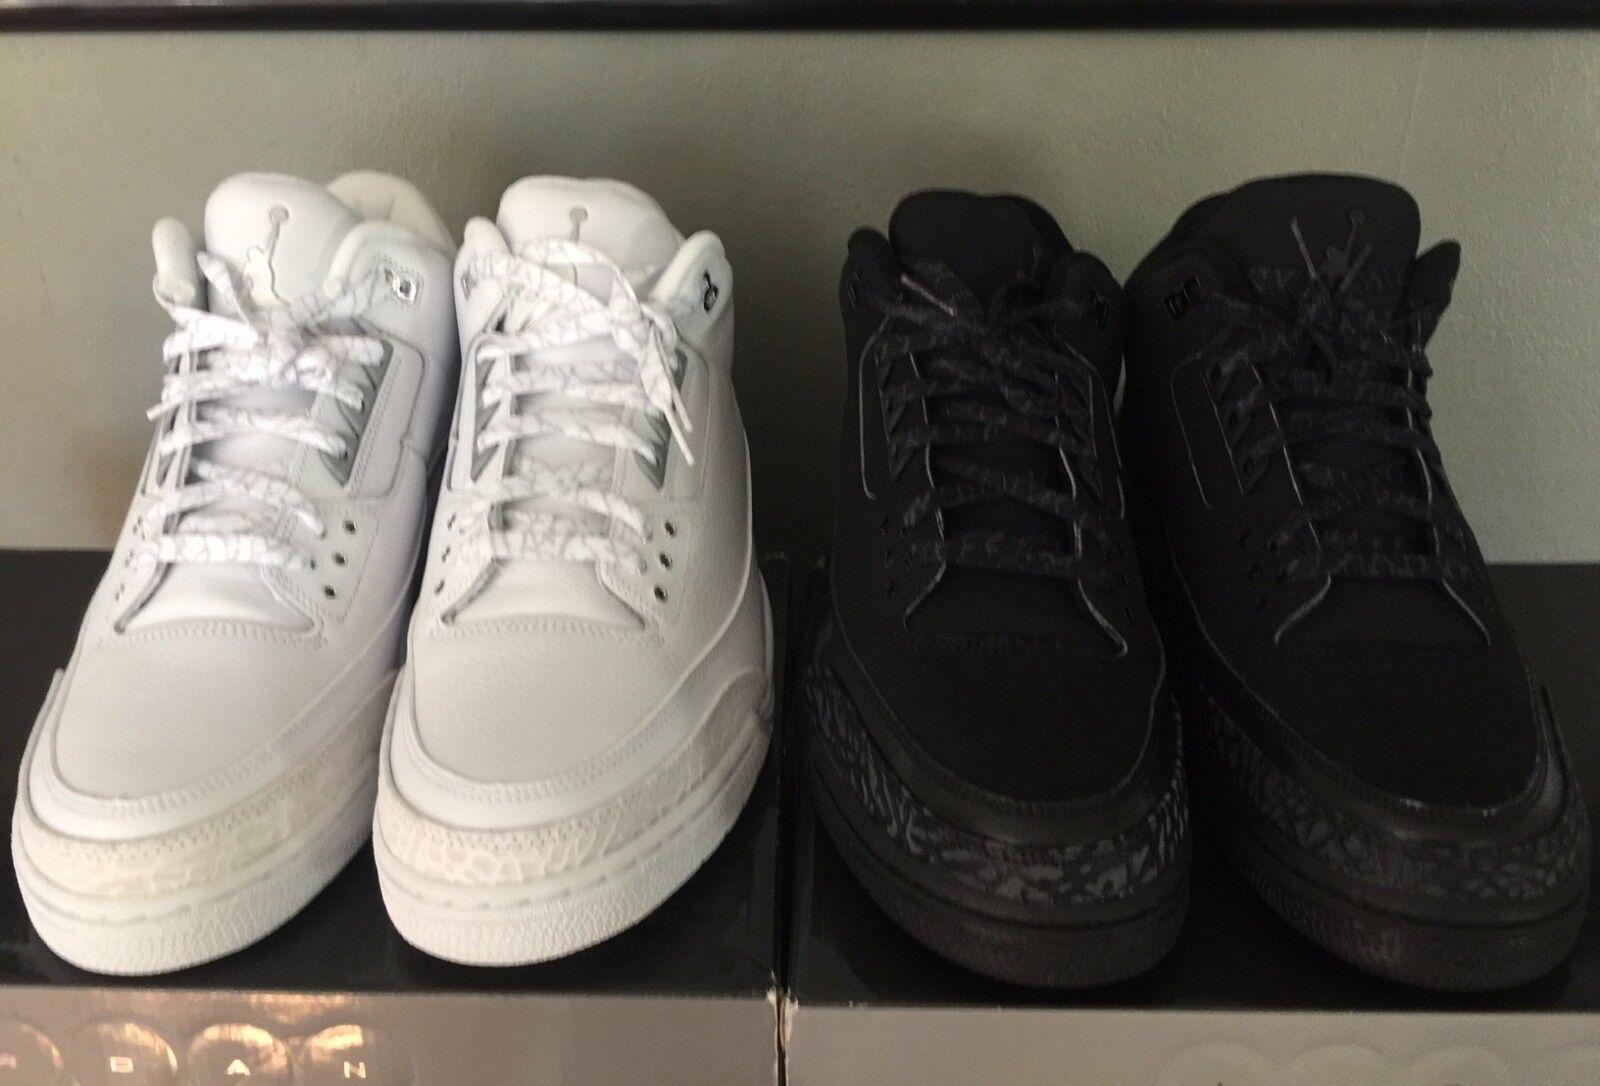 2007 Nike Air Jordan III Retro Black Cat & Pure   Money Size 13 DS